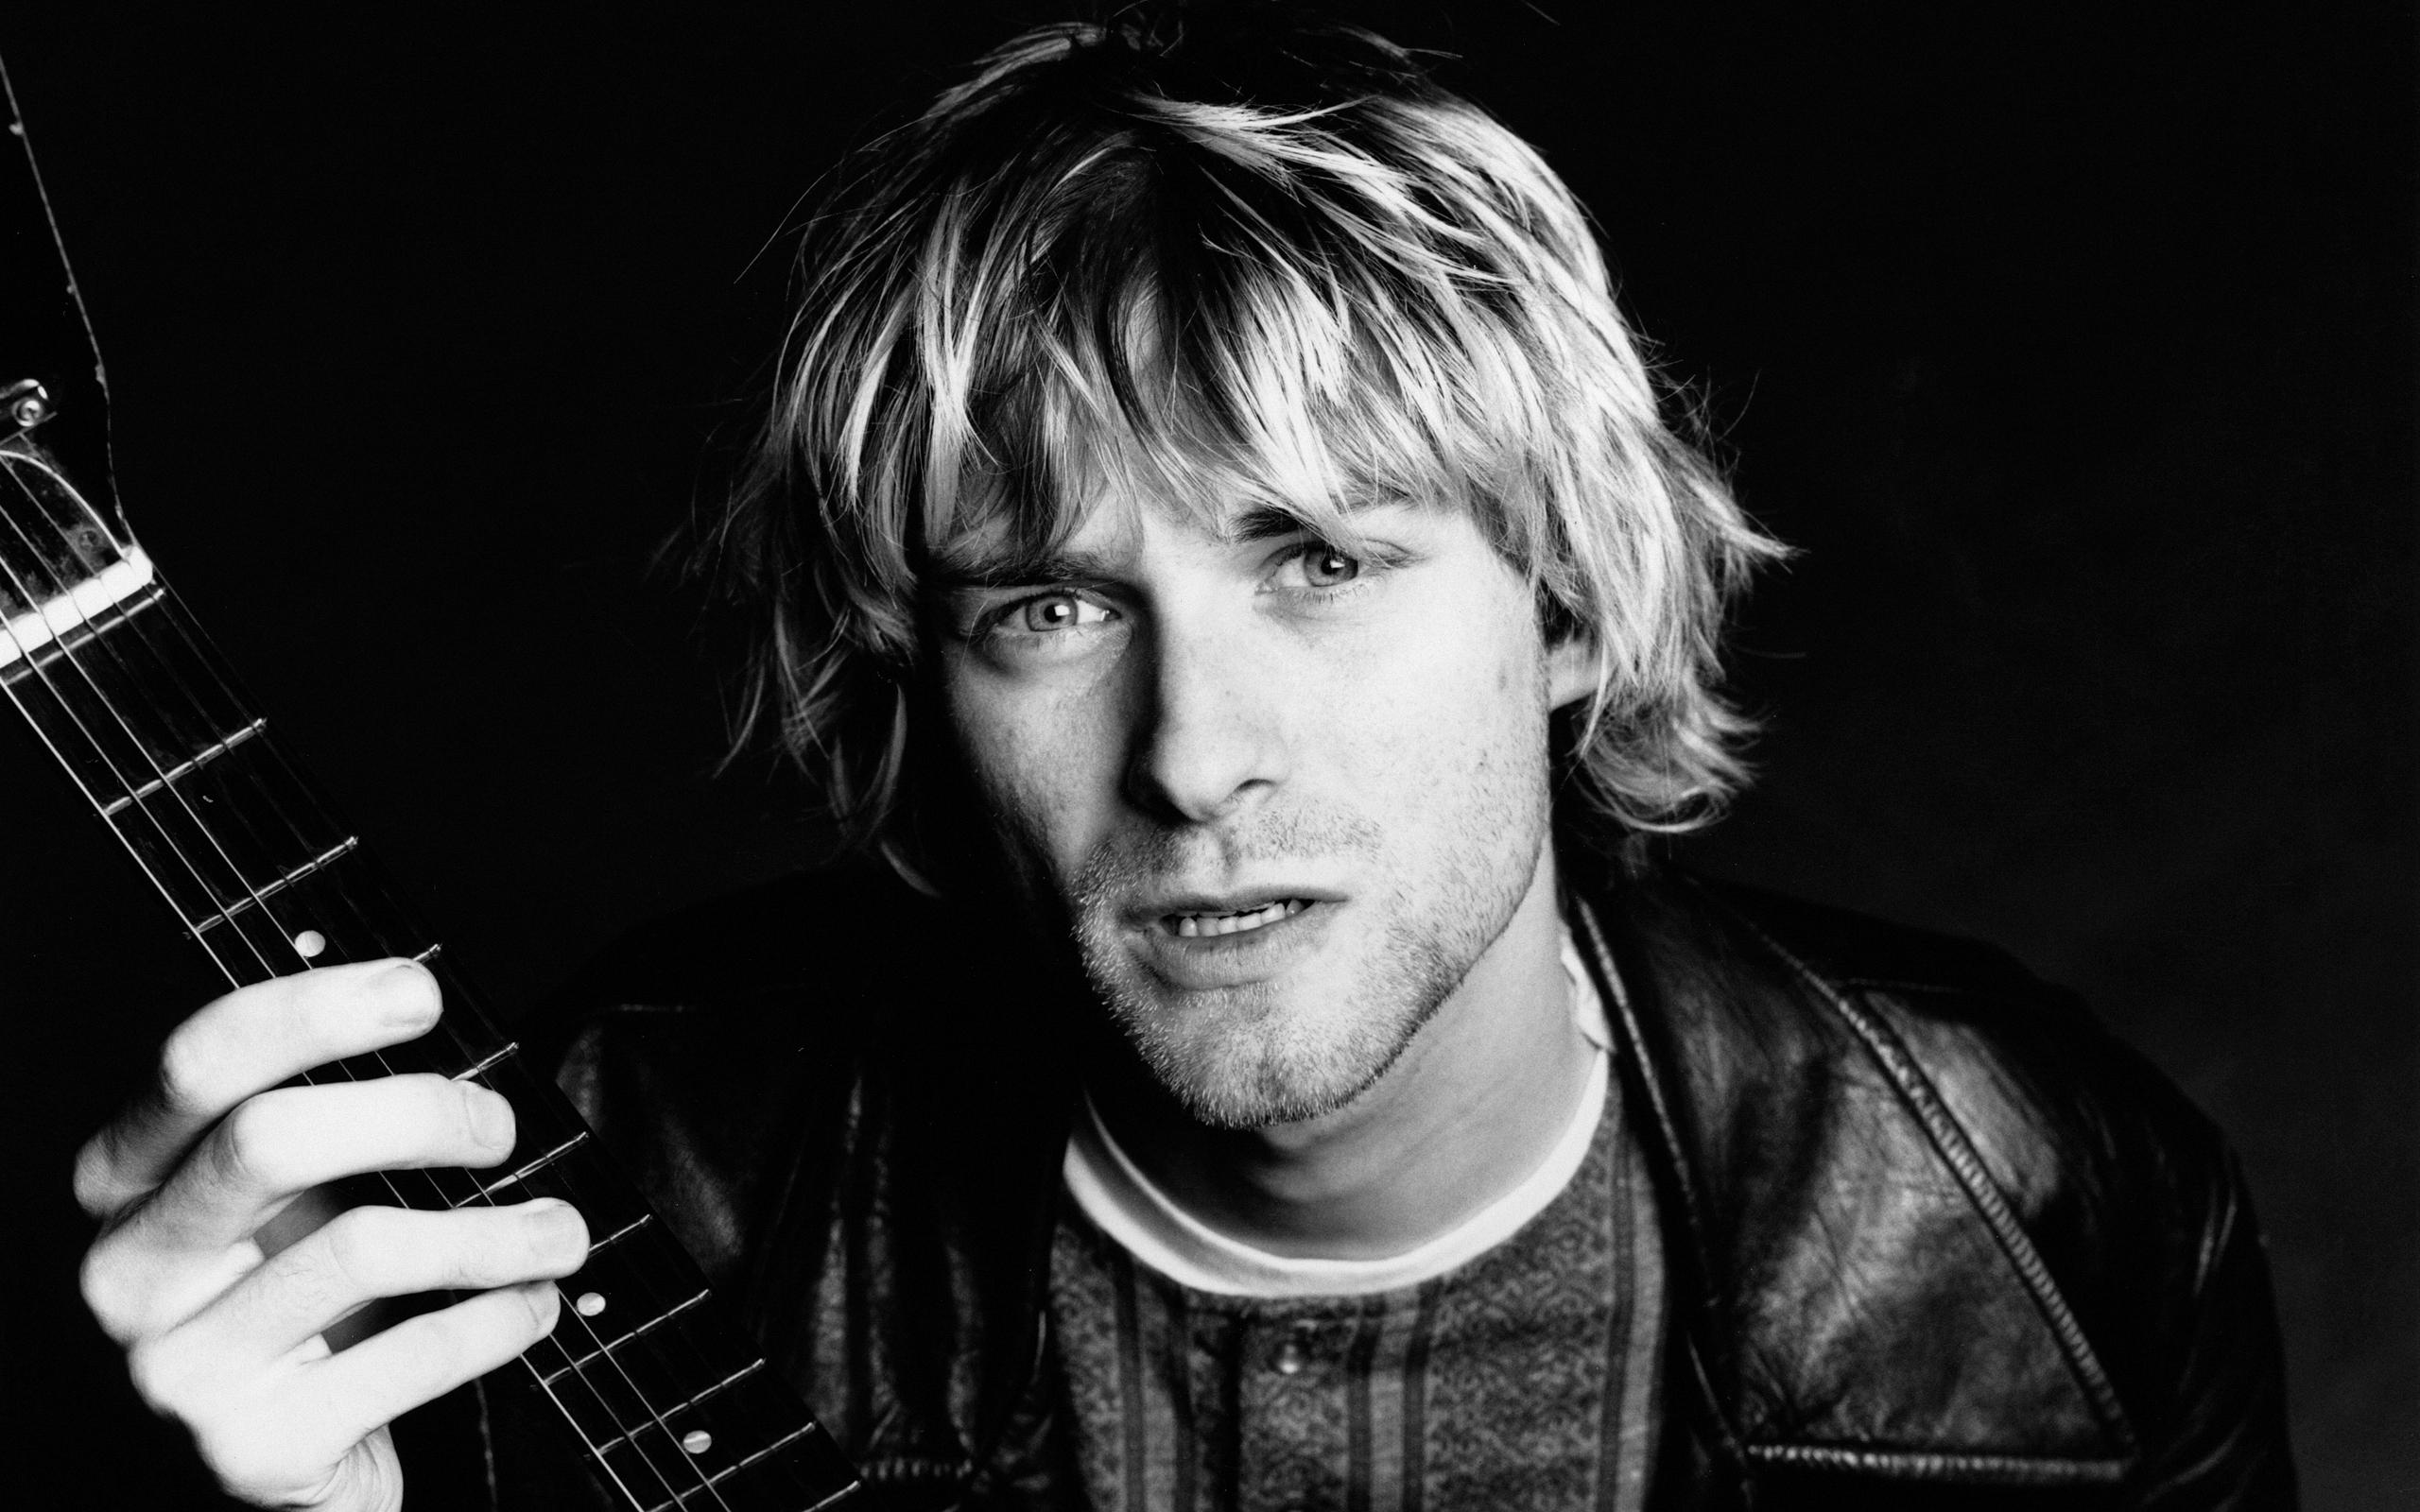 Fantastic Kurt Cobain Wallpaper 40924 2560x1600 px